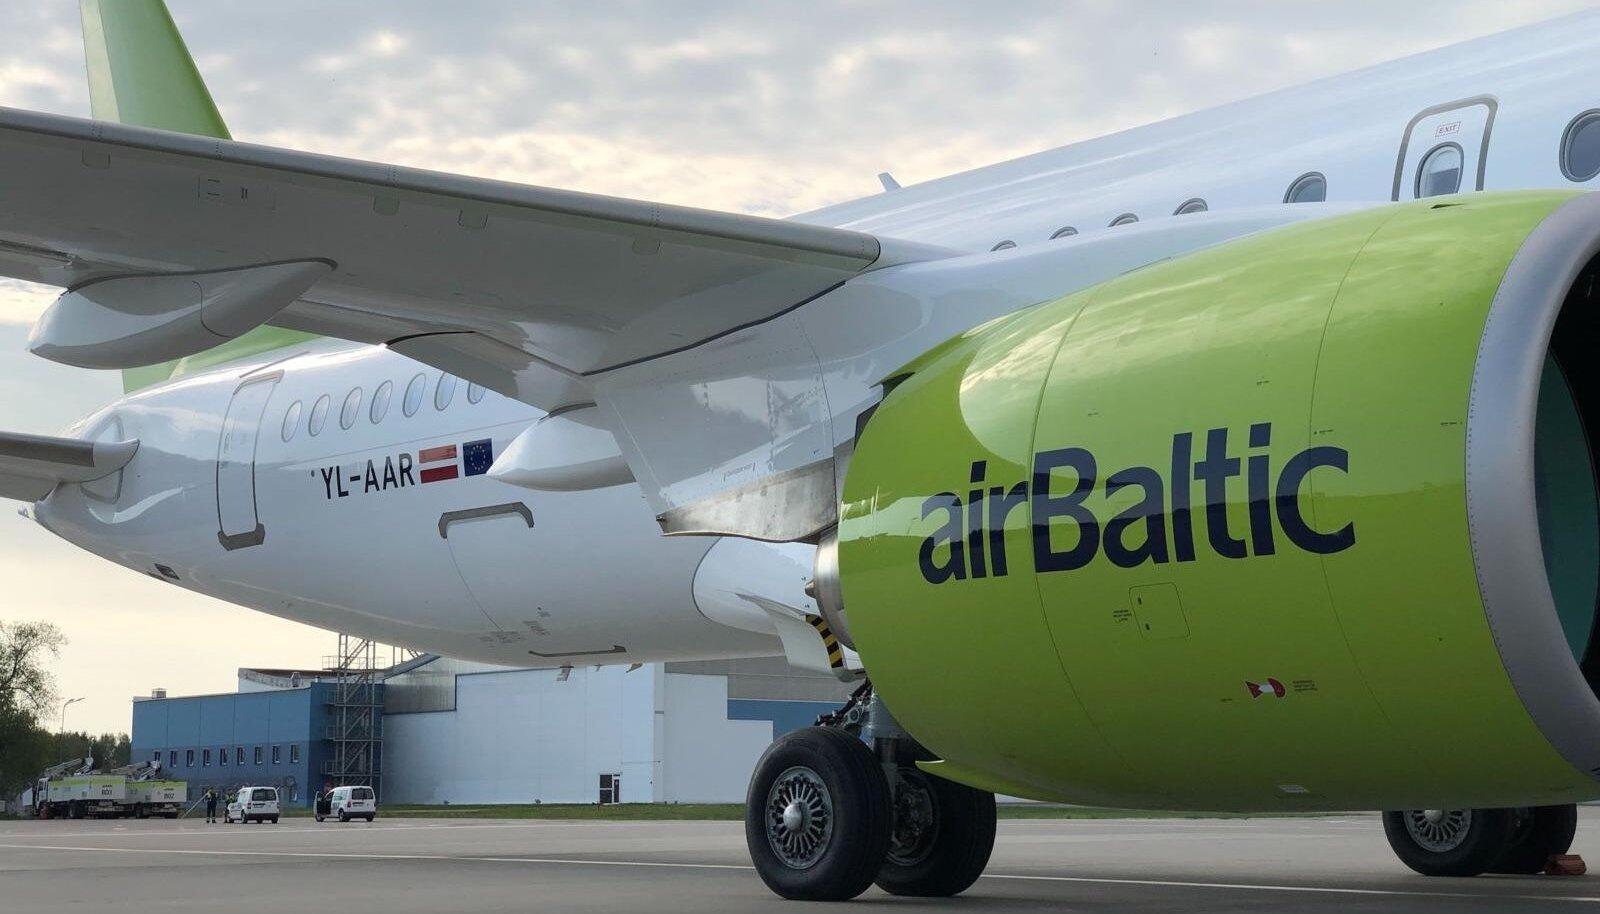 AirBalticu 18. Airbus A220-300 registreerimisnumbriga YL-AAR